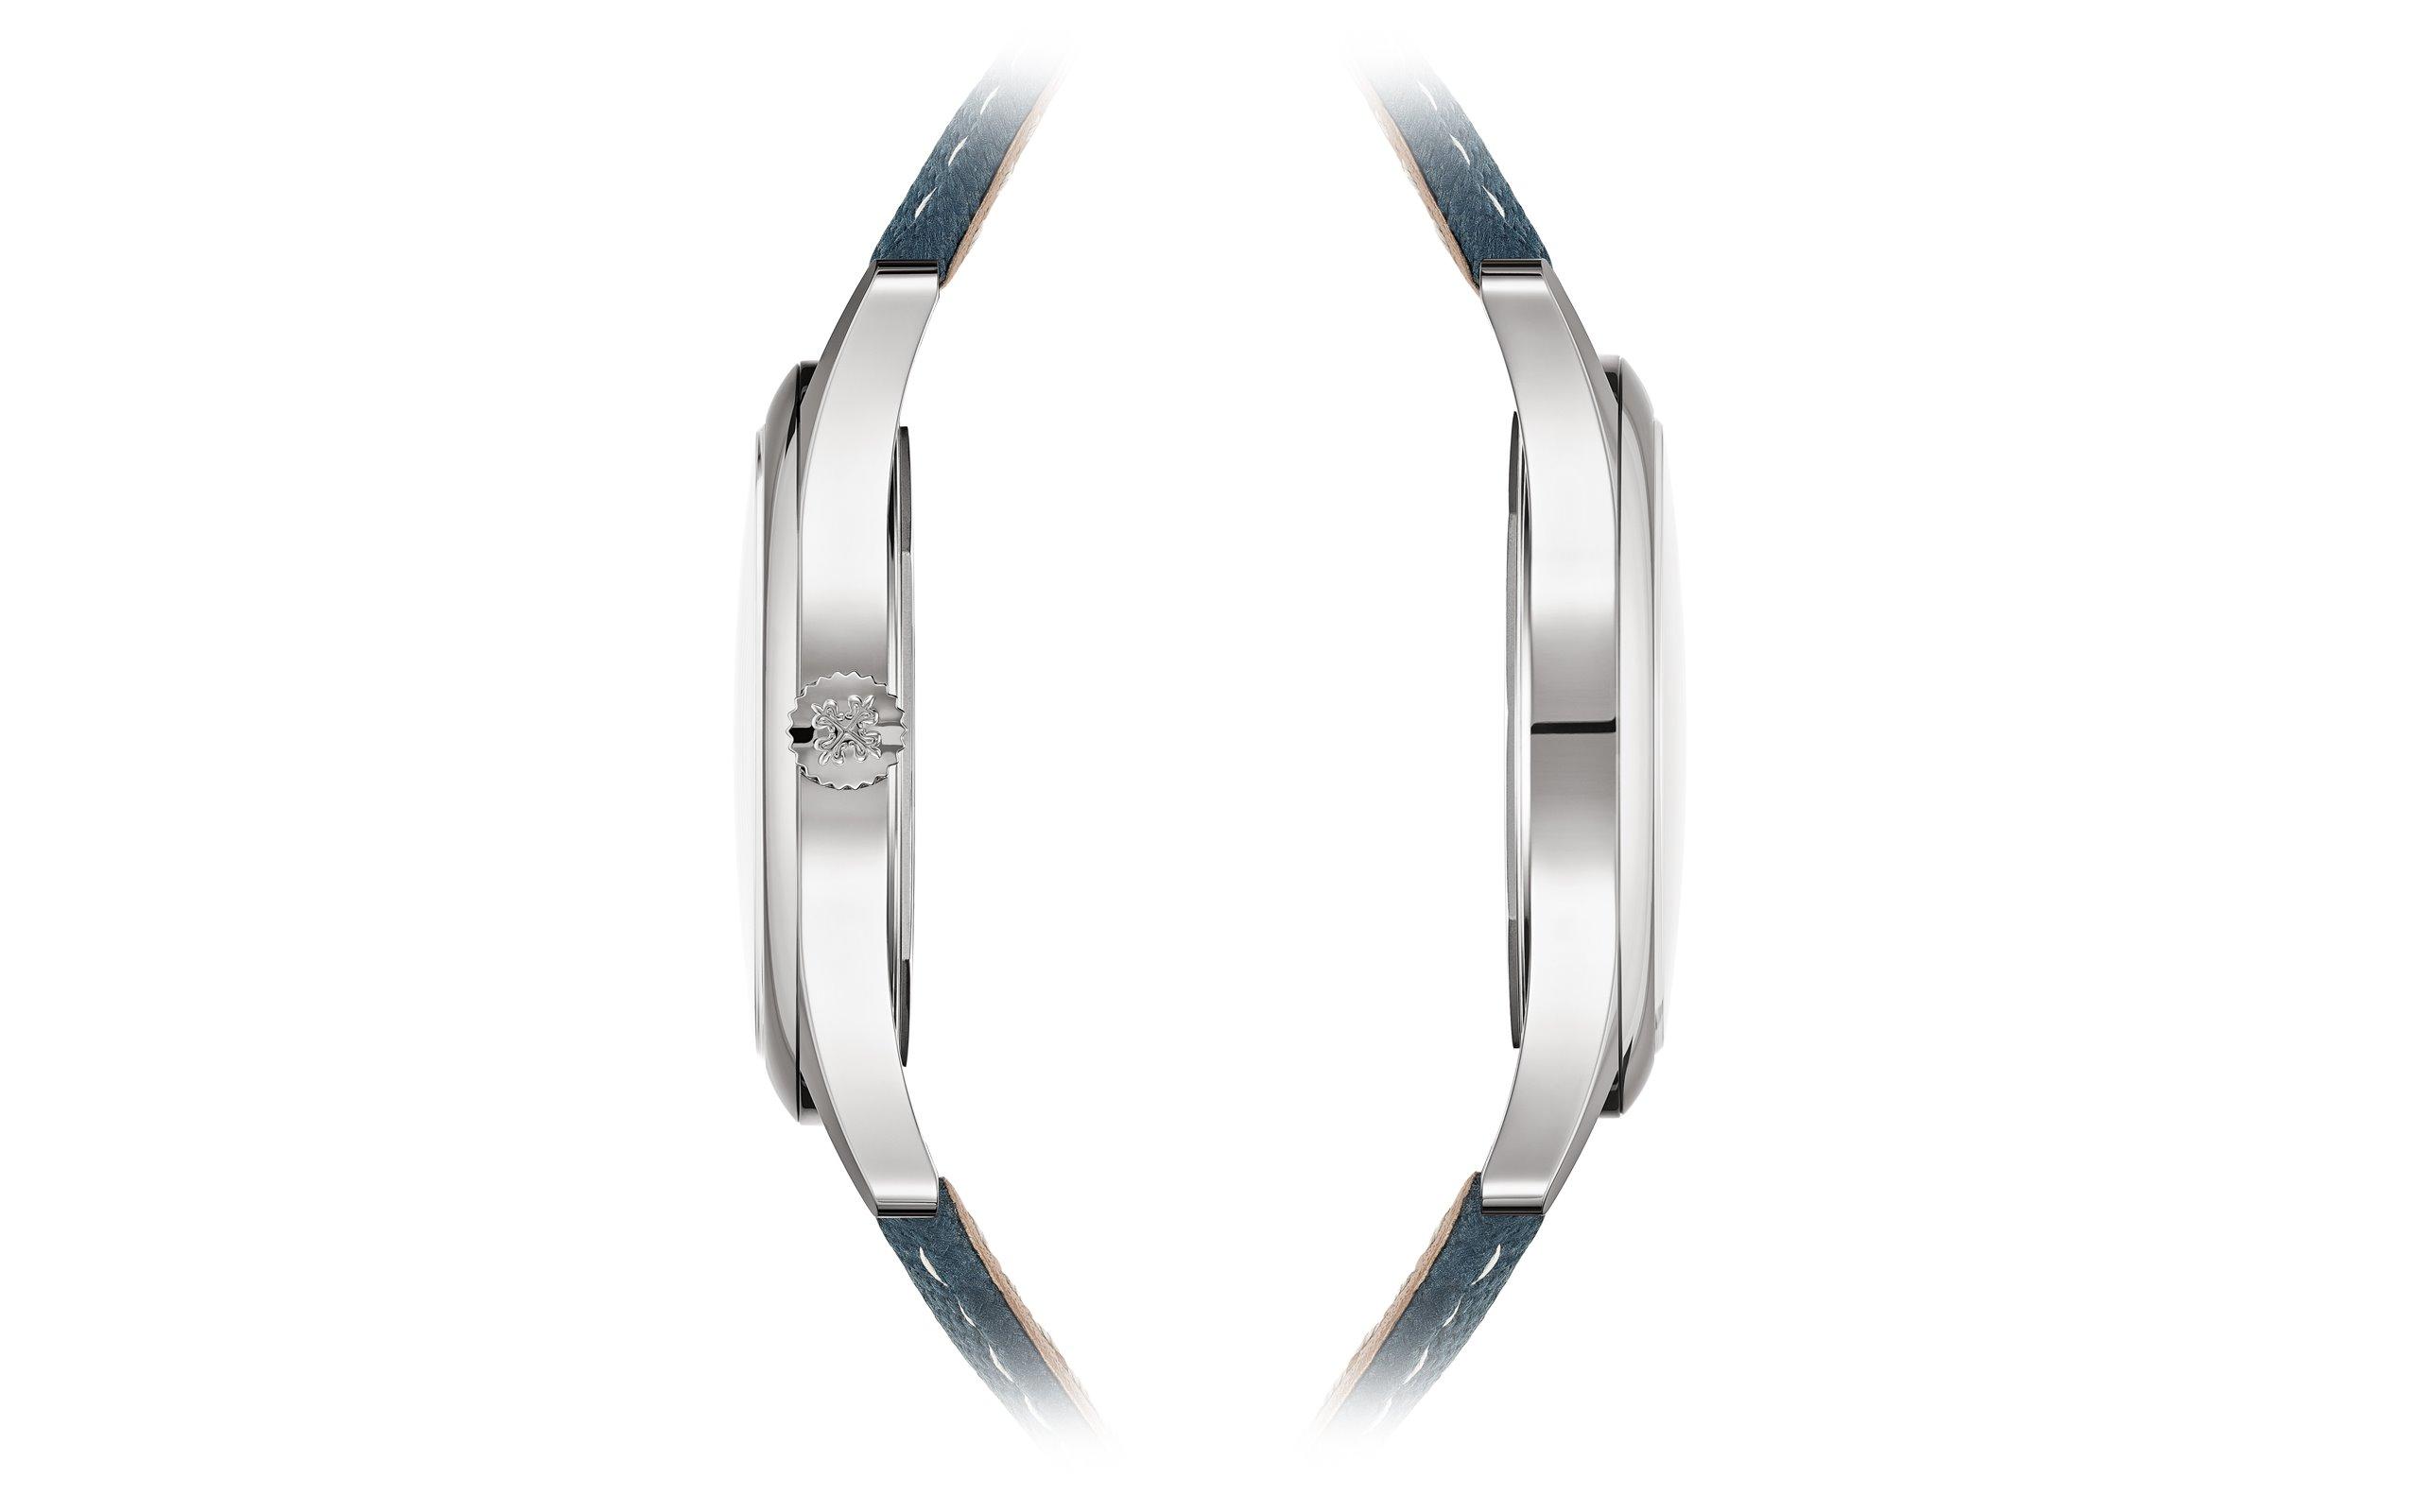 Patek Philippe Calatrava Ref 6007A-001